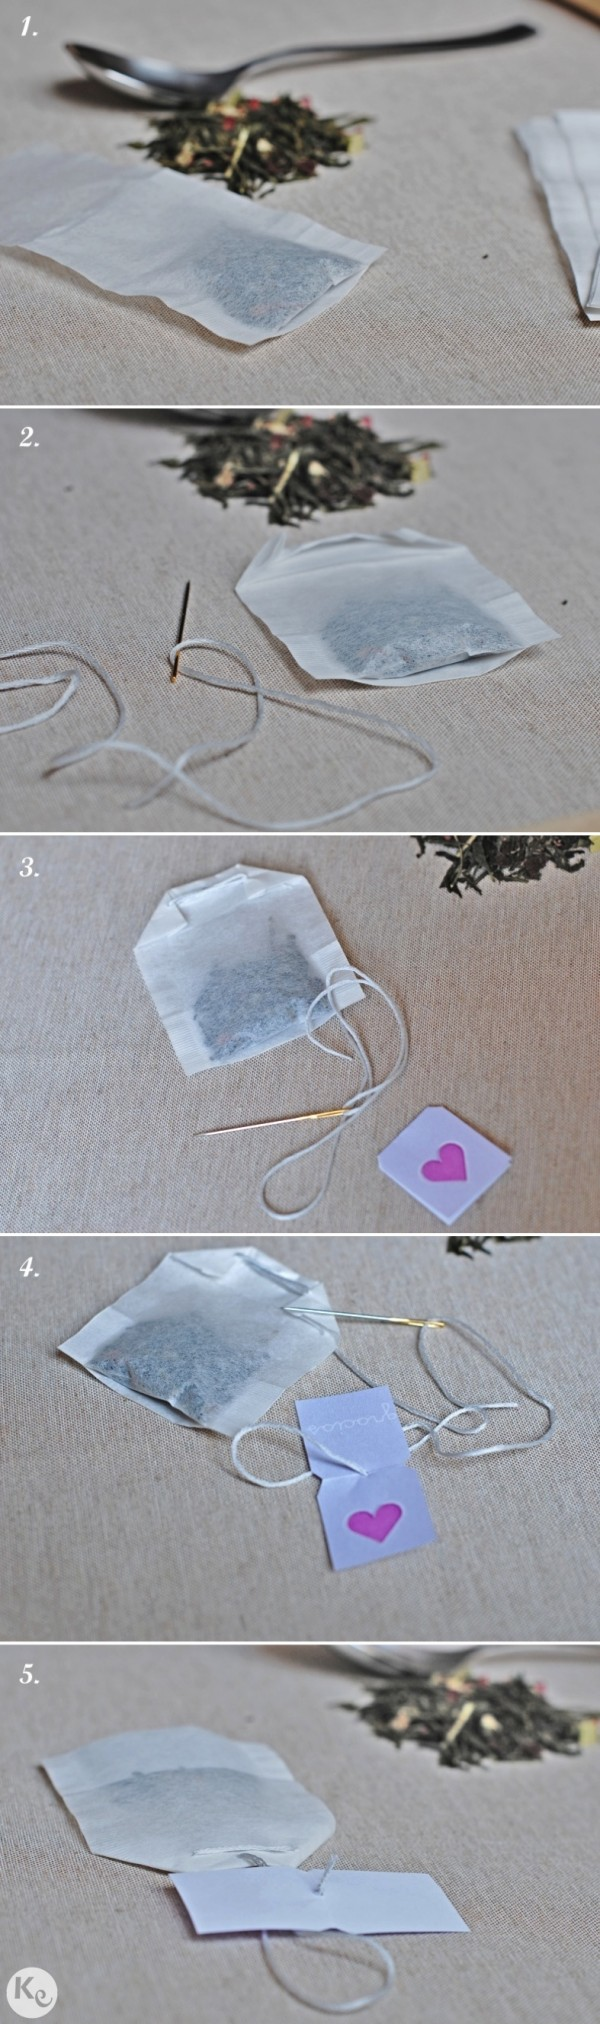 Diybolsitas de té personalizadasdetalle invitadoscustom tea bag